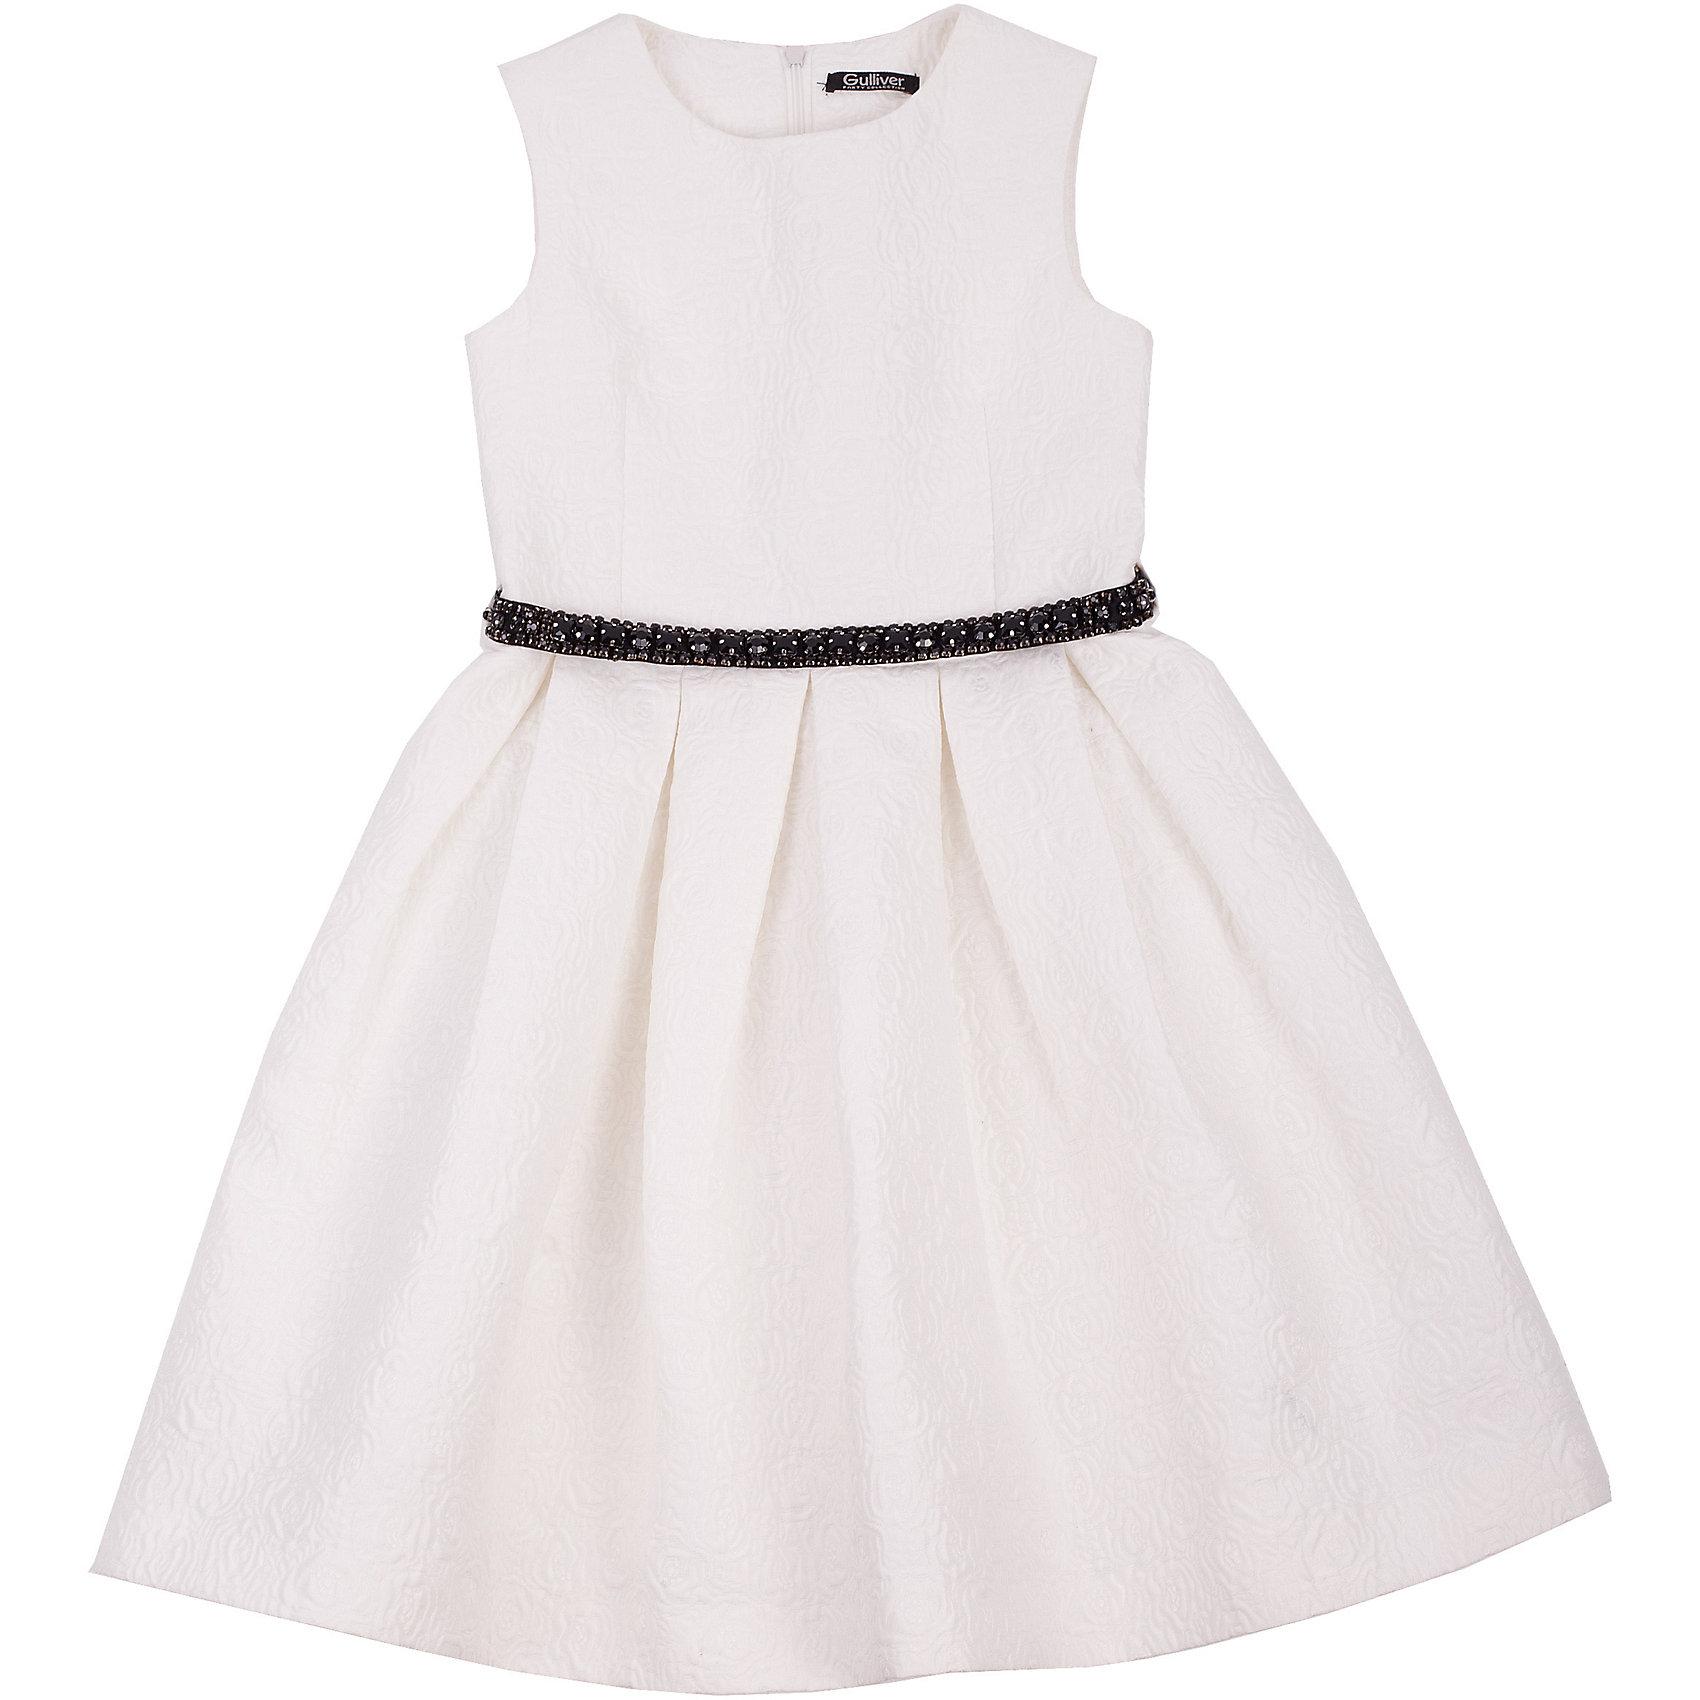 Gulliver Нарядное платье для девочки Gulliver gulliver брюки для девочки gulliver